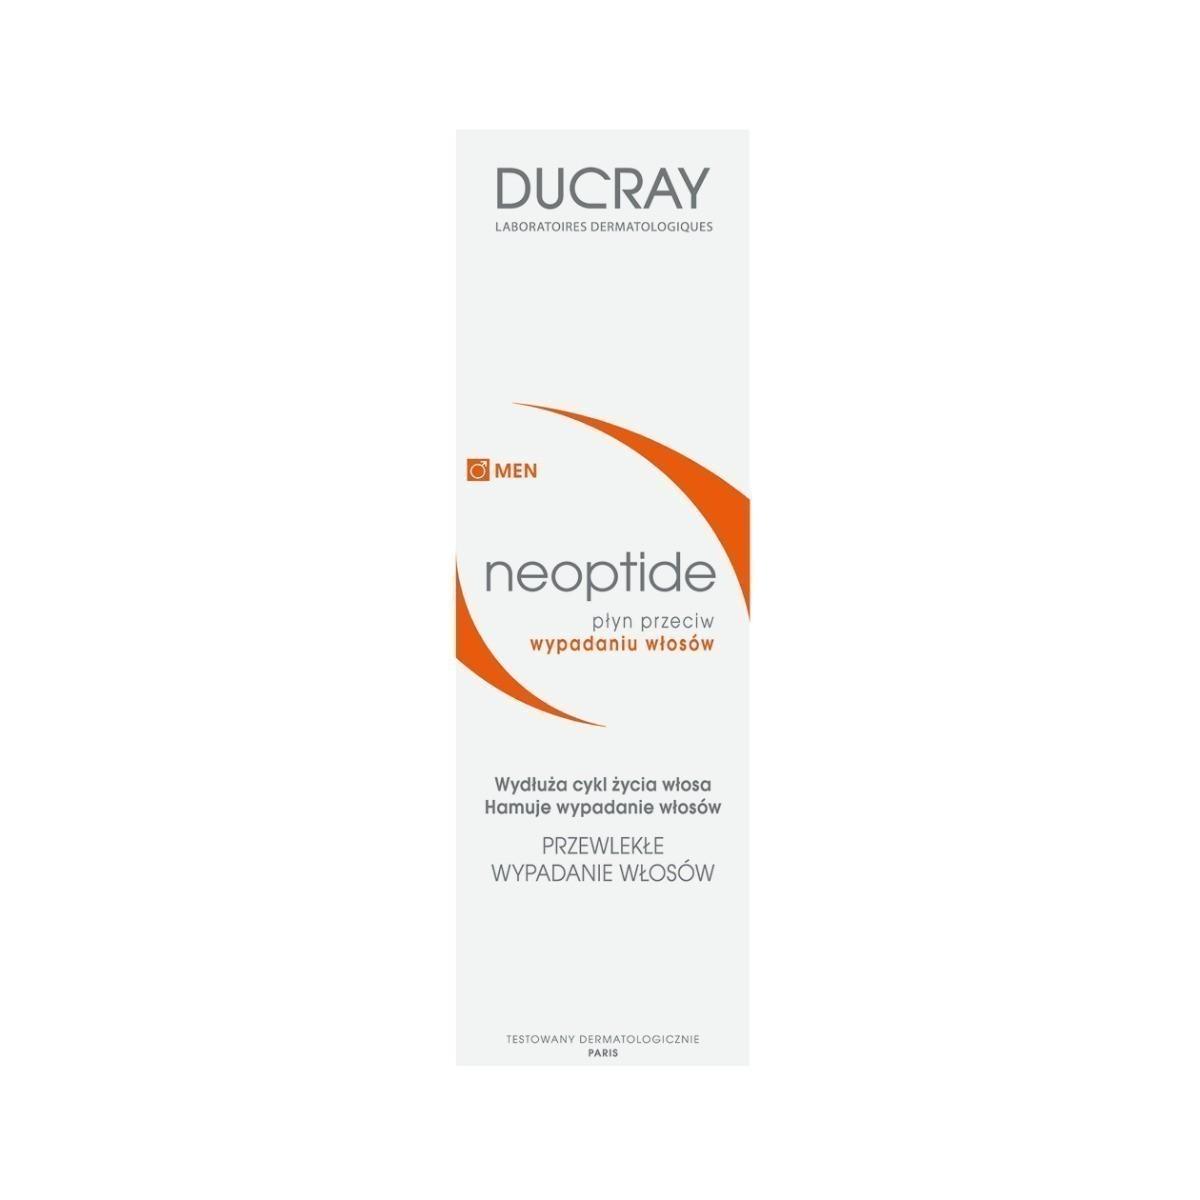 Ducray Neoptide